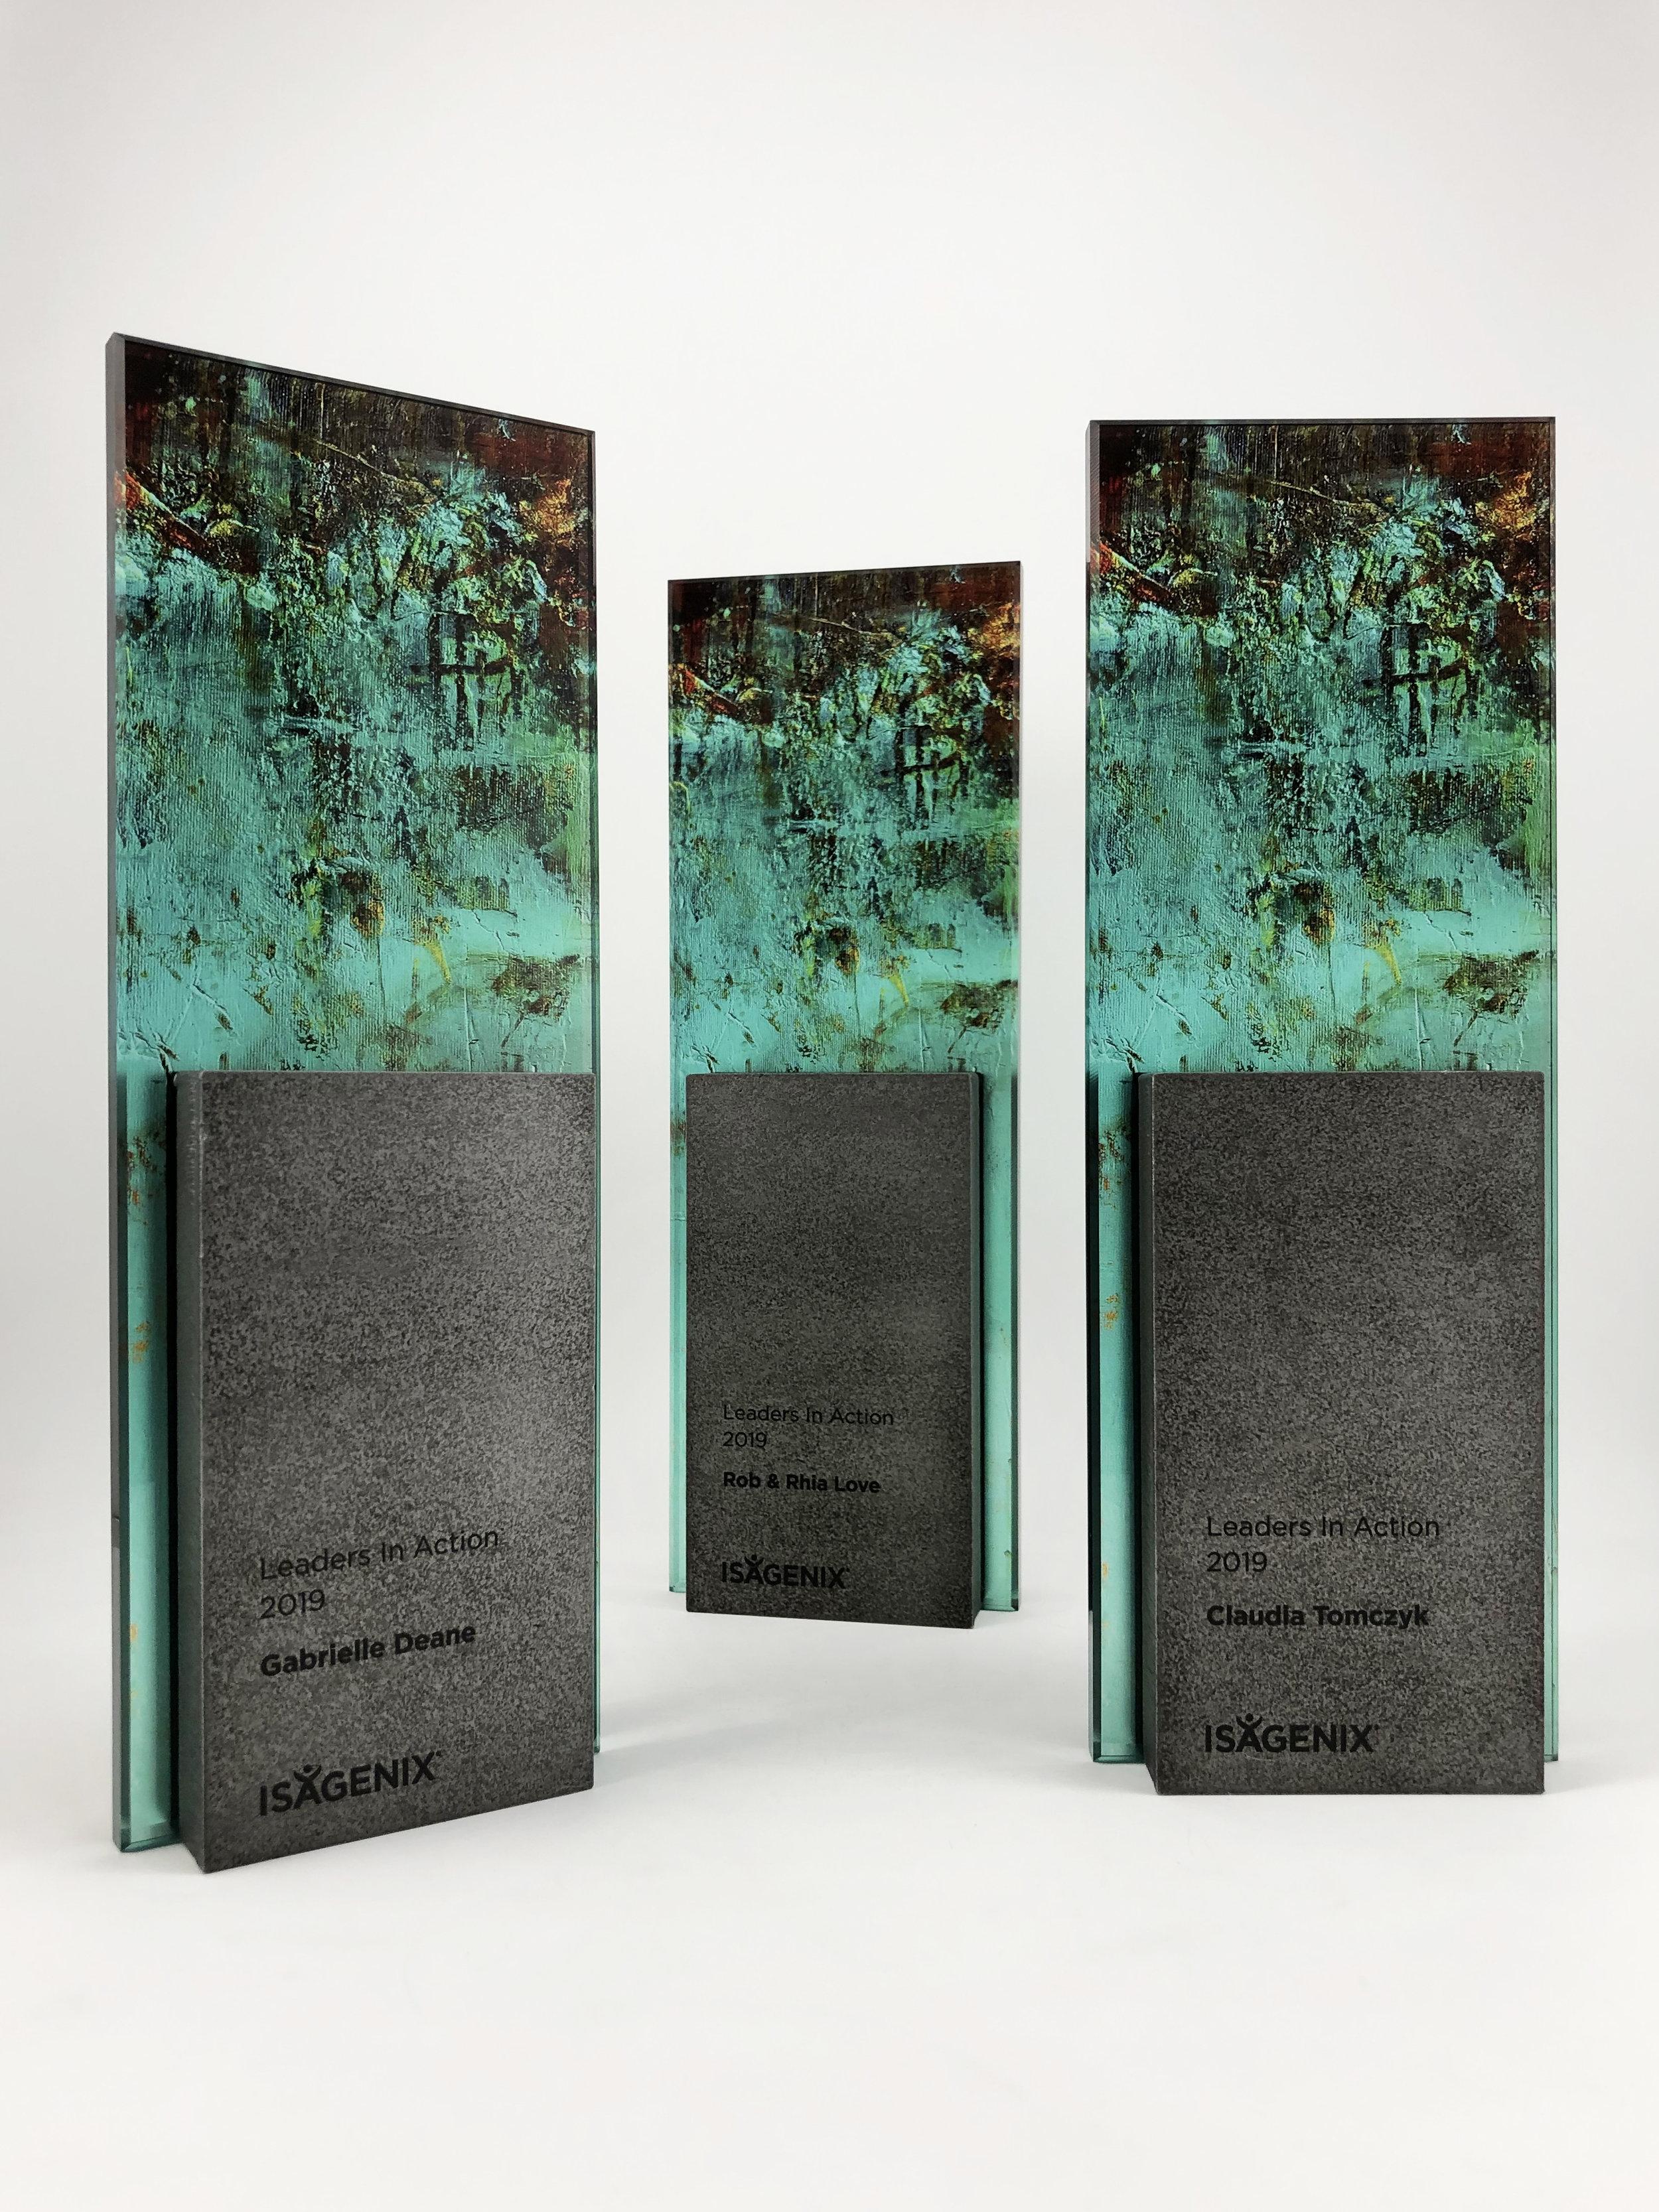 isagenix-metal-glass-art-trophy-awards-sculpture-2019-01.jpg